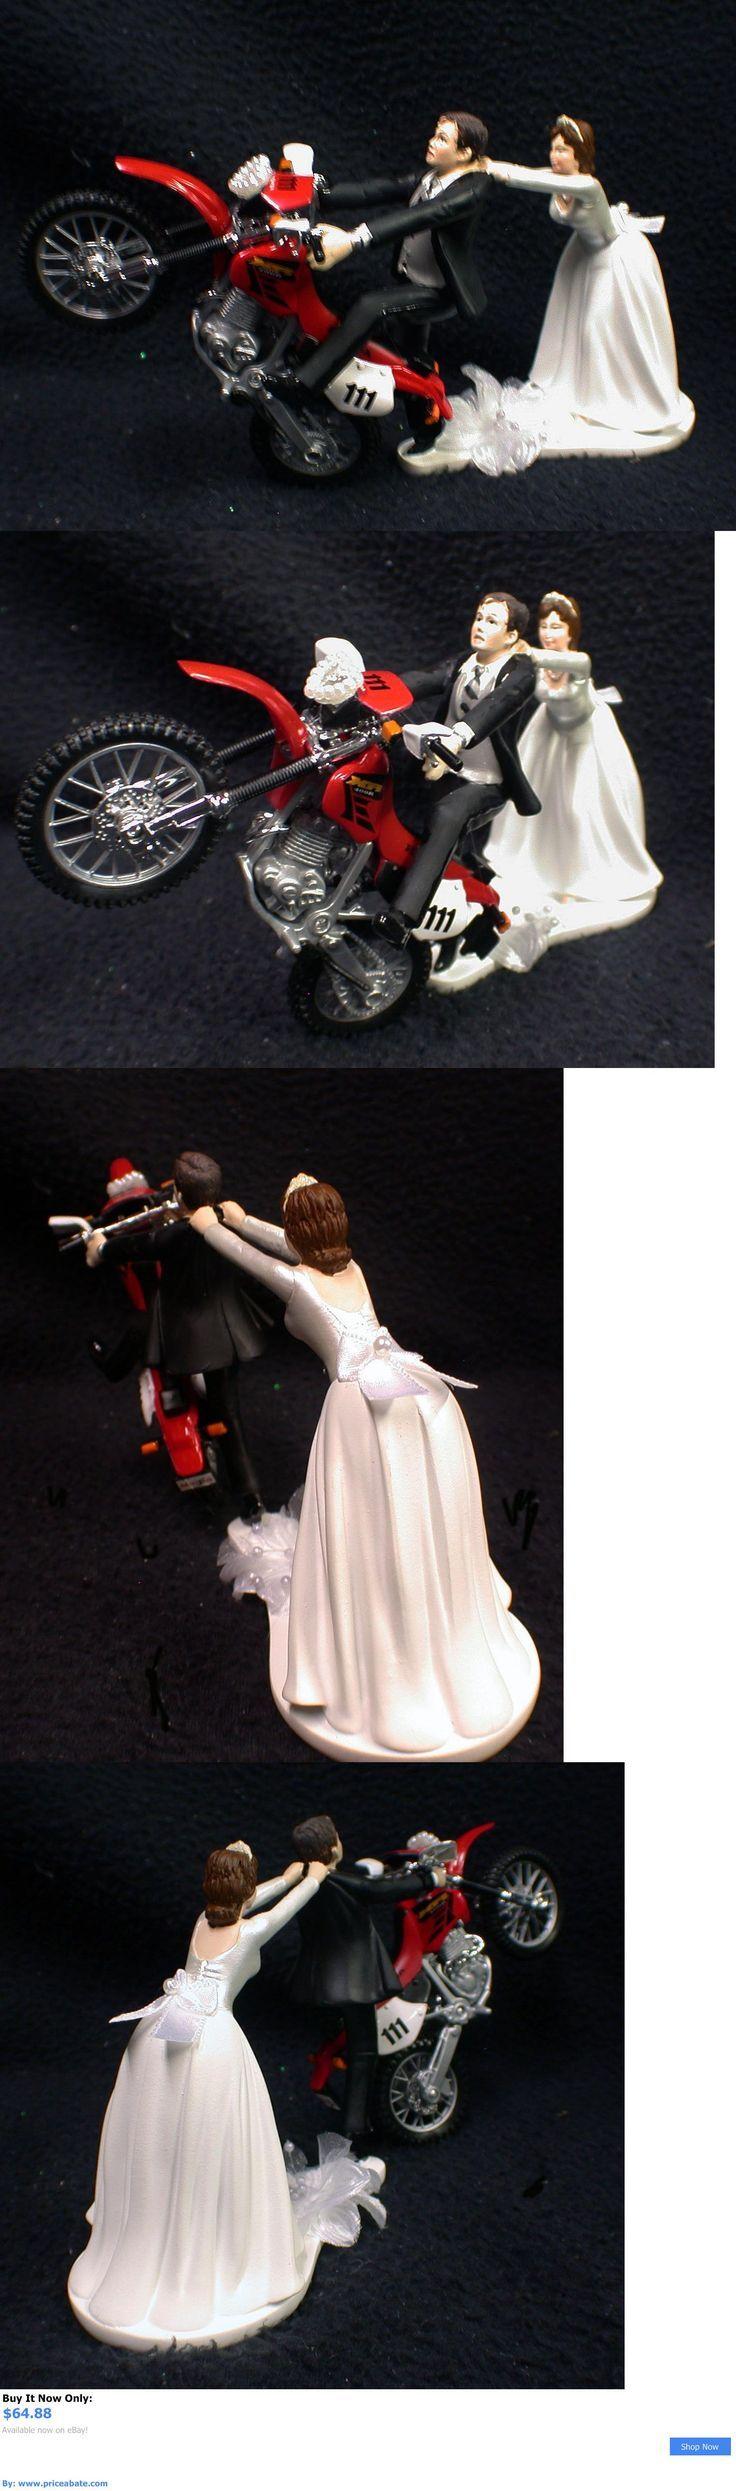 Wedding Cakes Toppers: Off Road Dirt Bike Motorcycle Wedding Cake ...